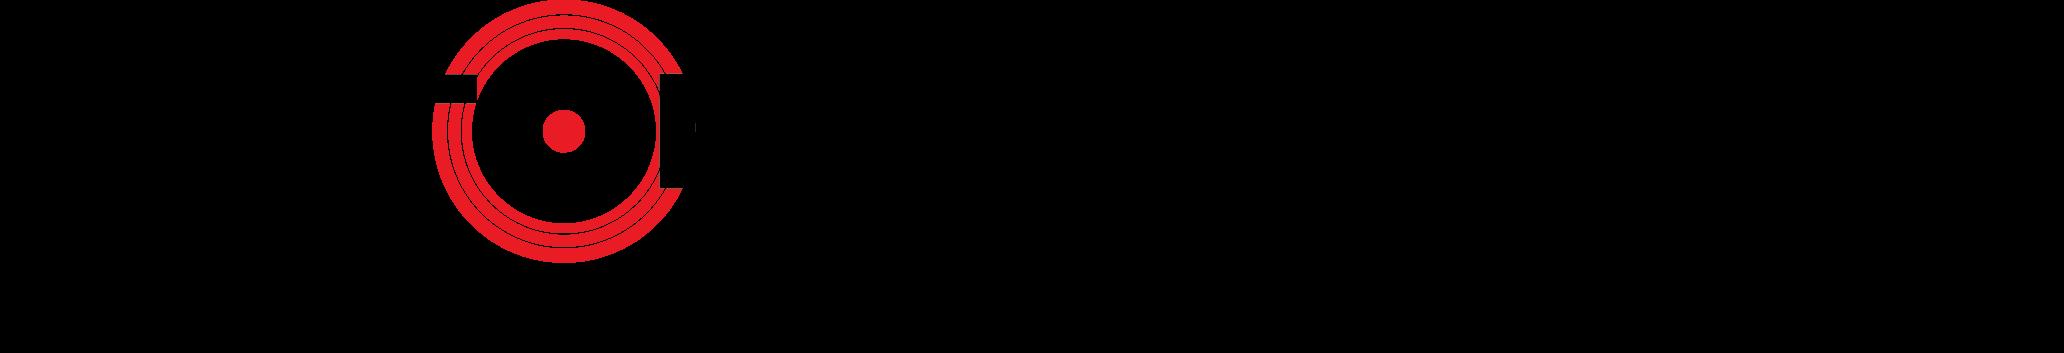 Autoværksted & Mekaniker Herning / Autopunkt A/S